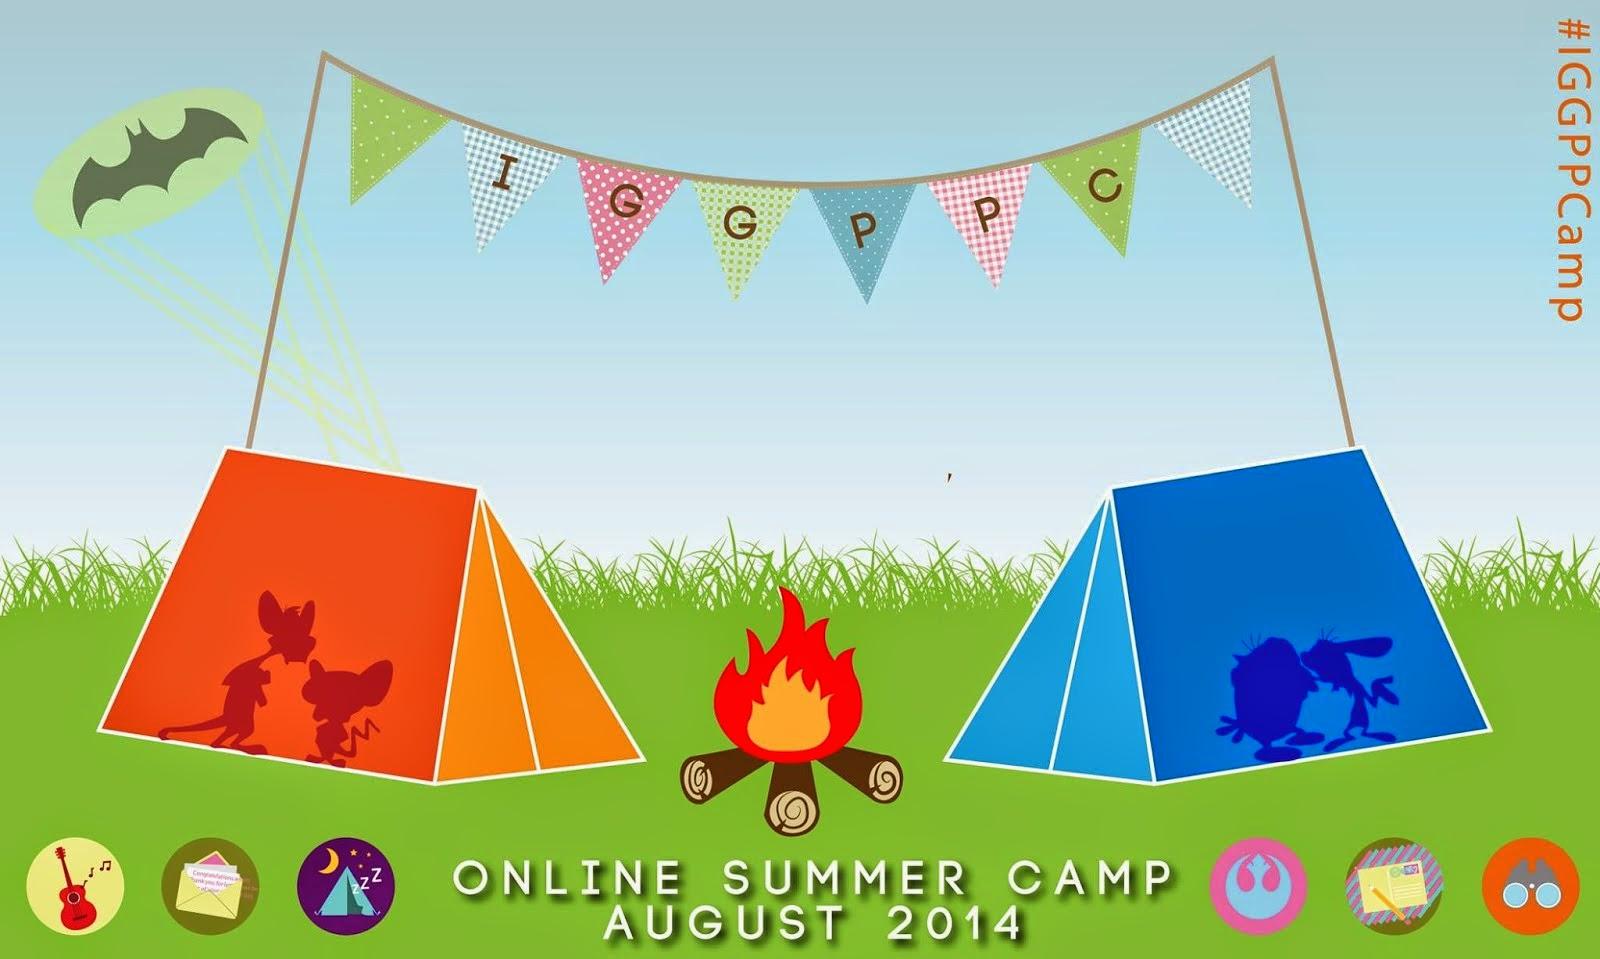 IGGPPC Summer Camp